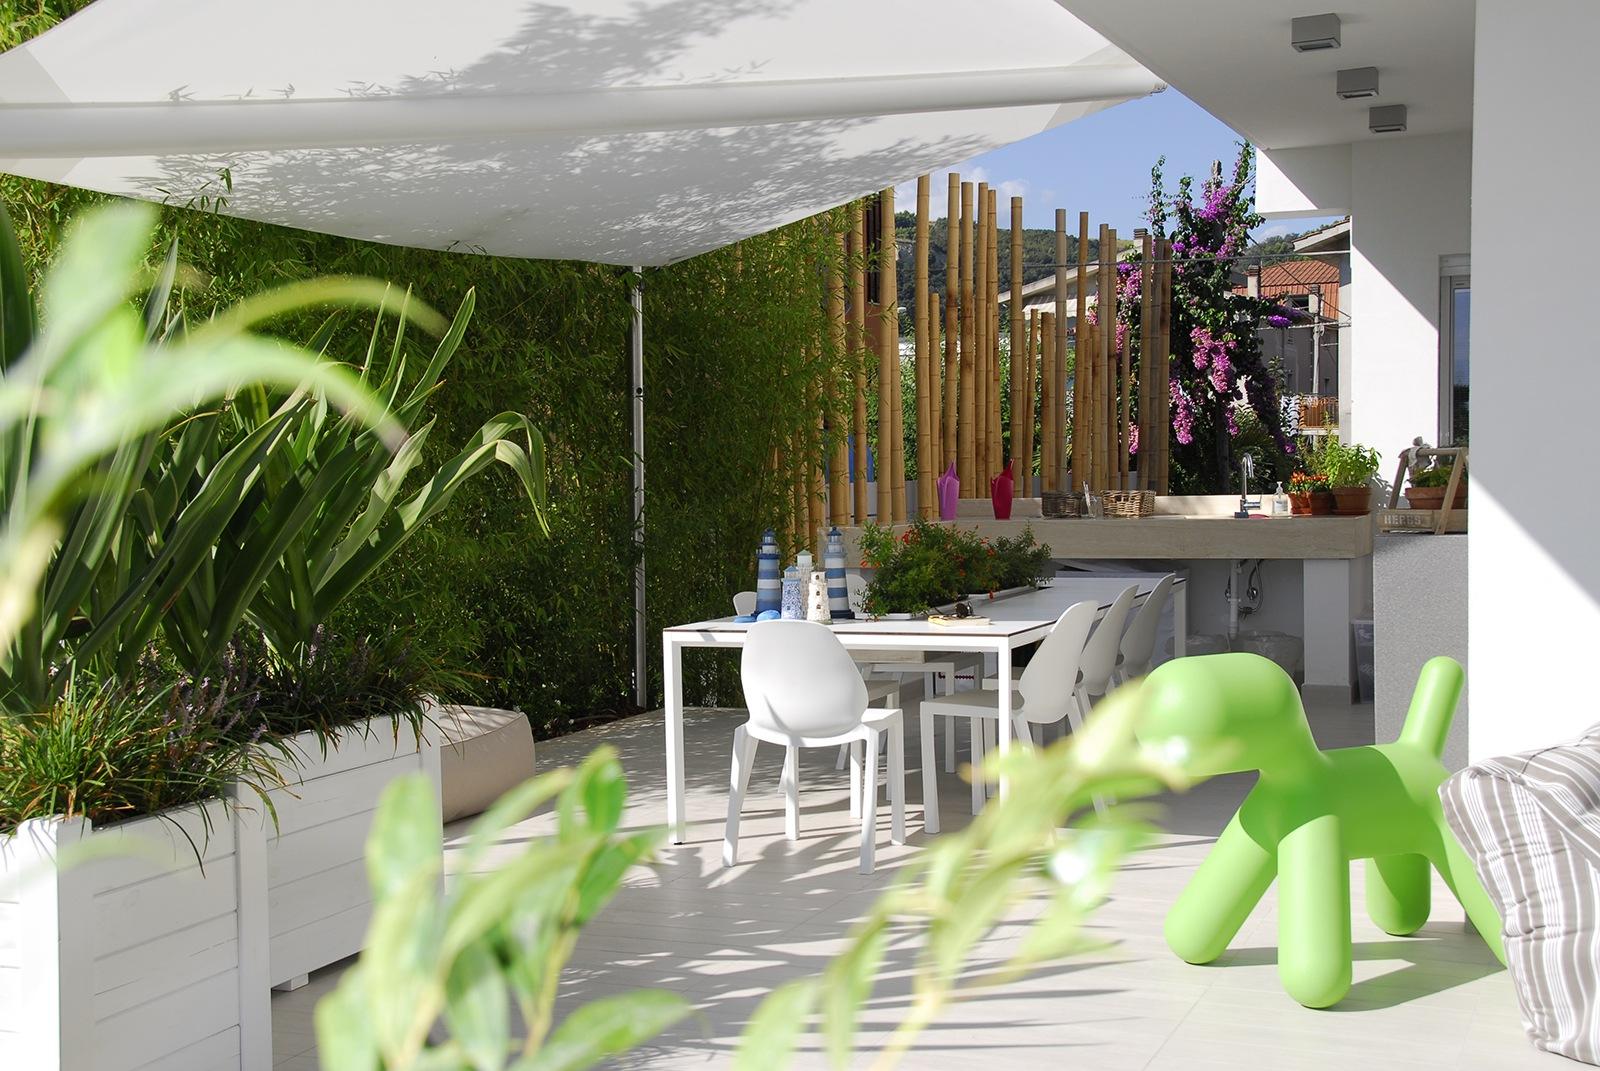 Cool with giardini moderni design - Design giardini ...